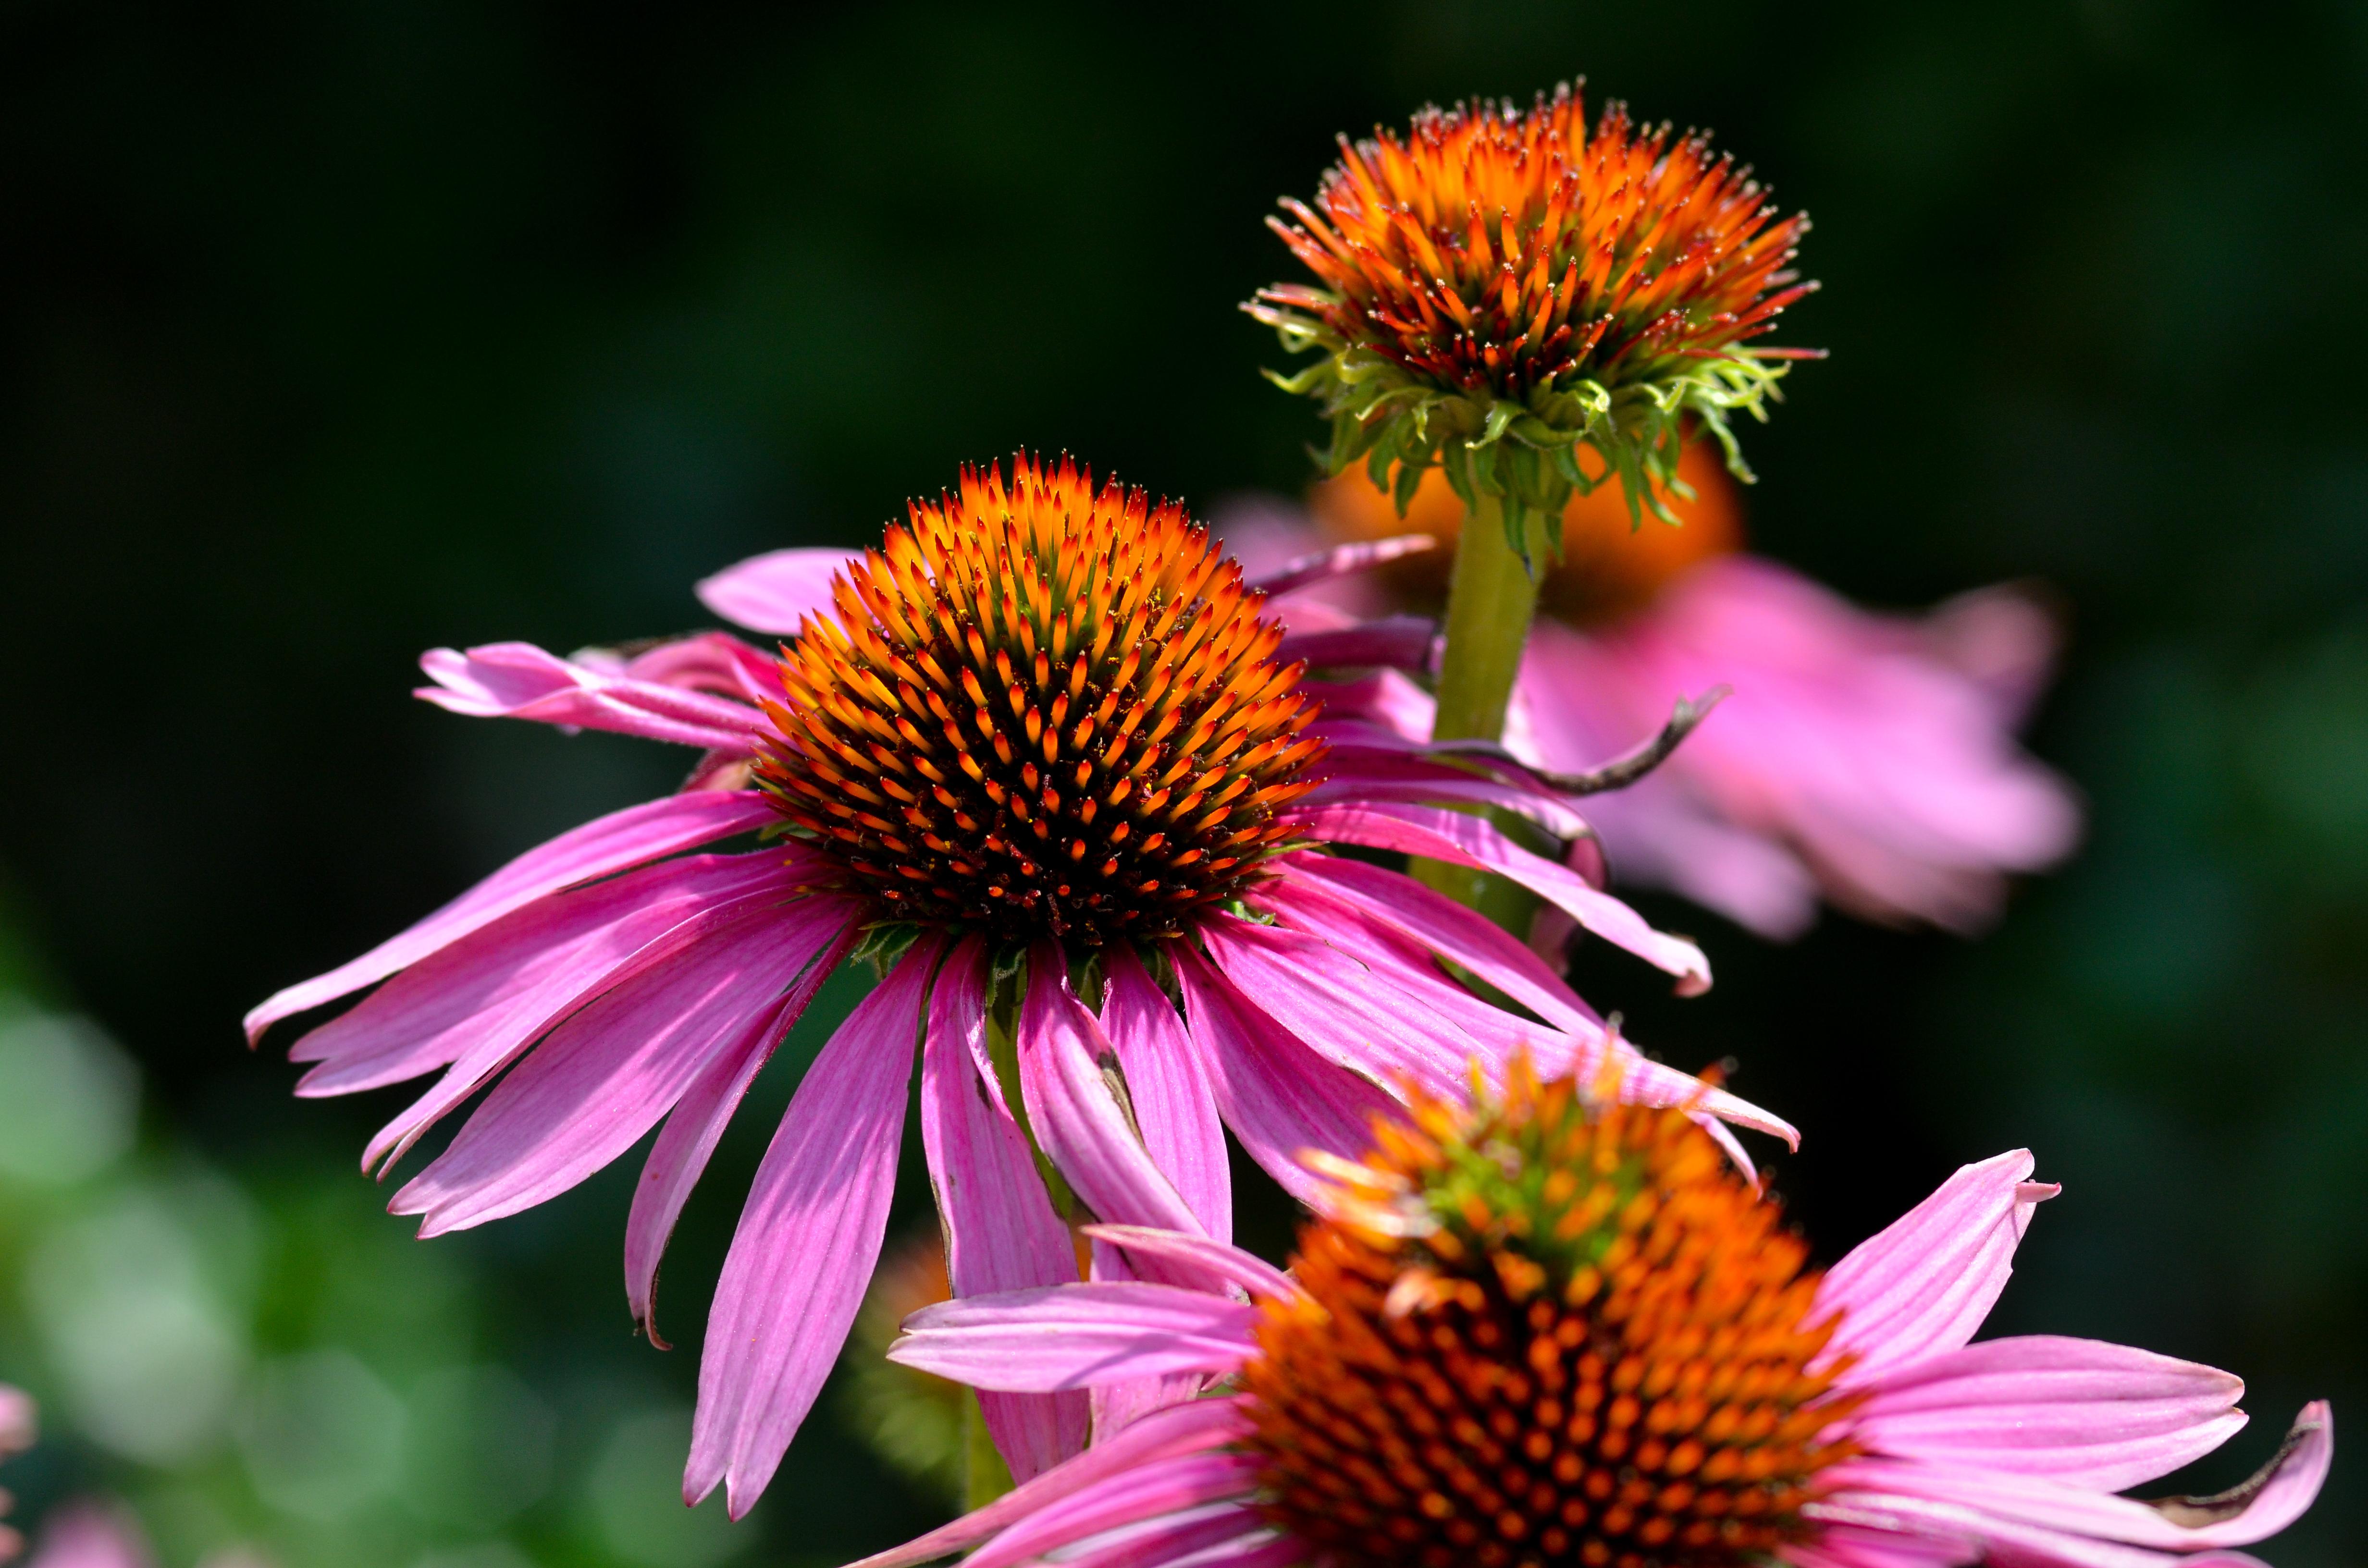 Floral Echinacea